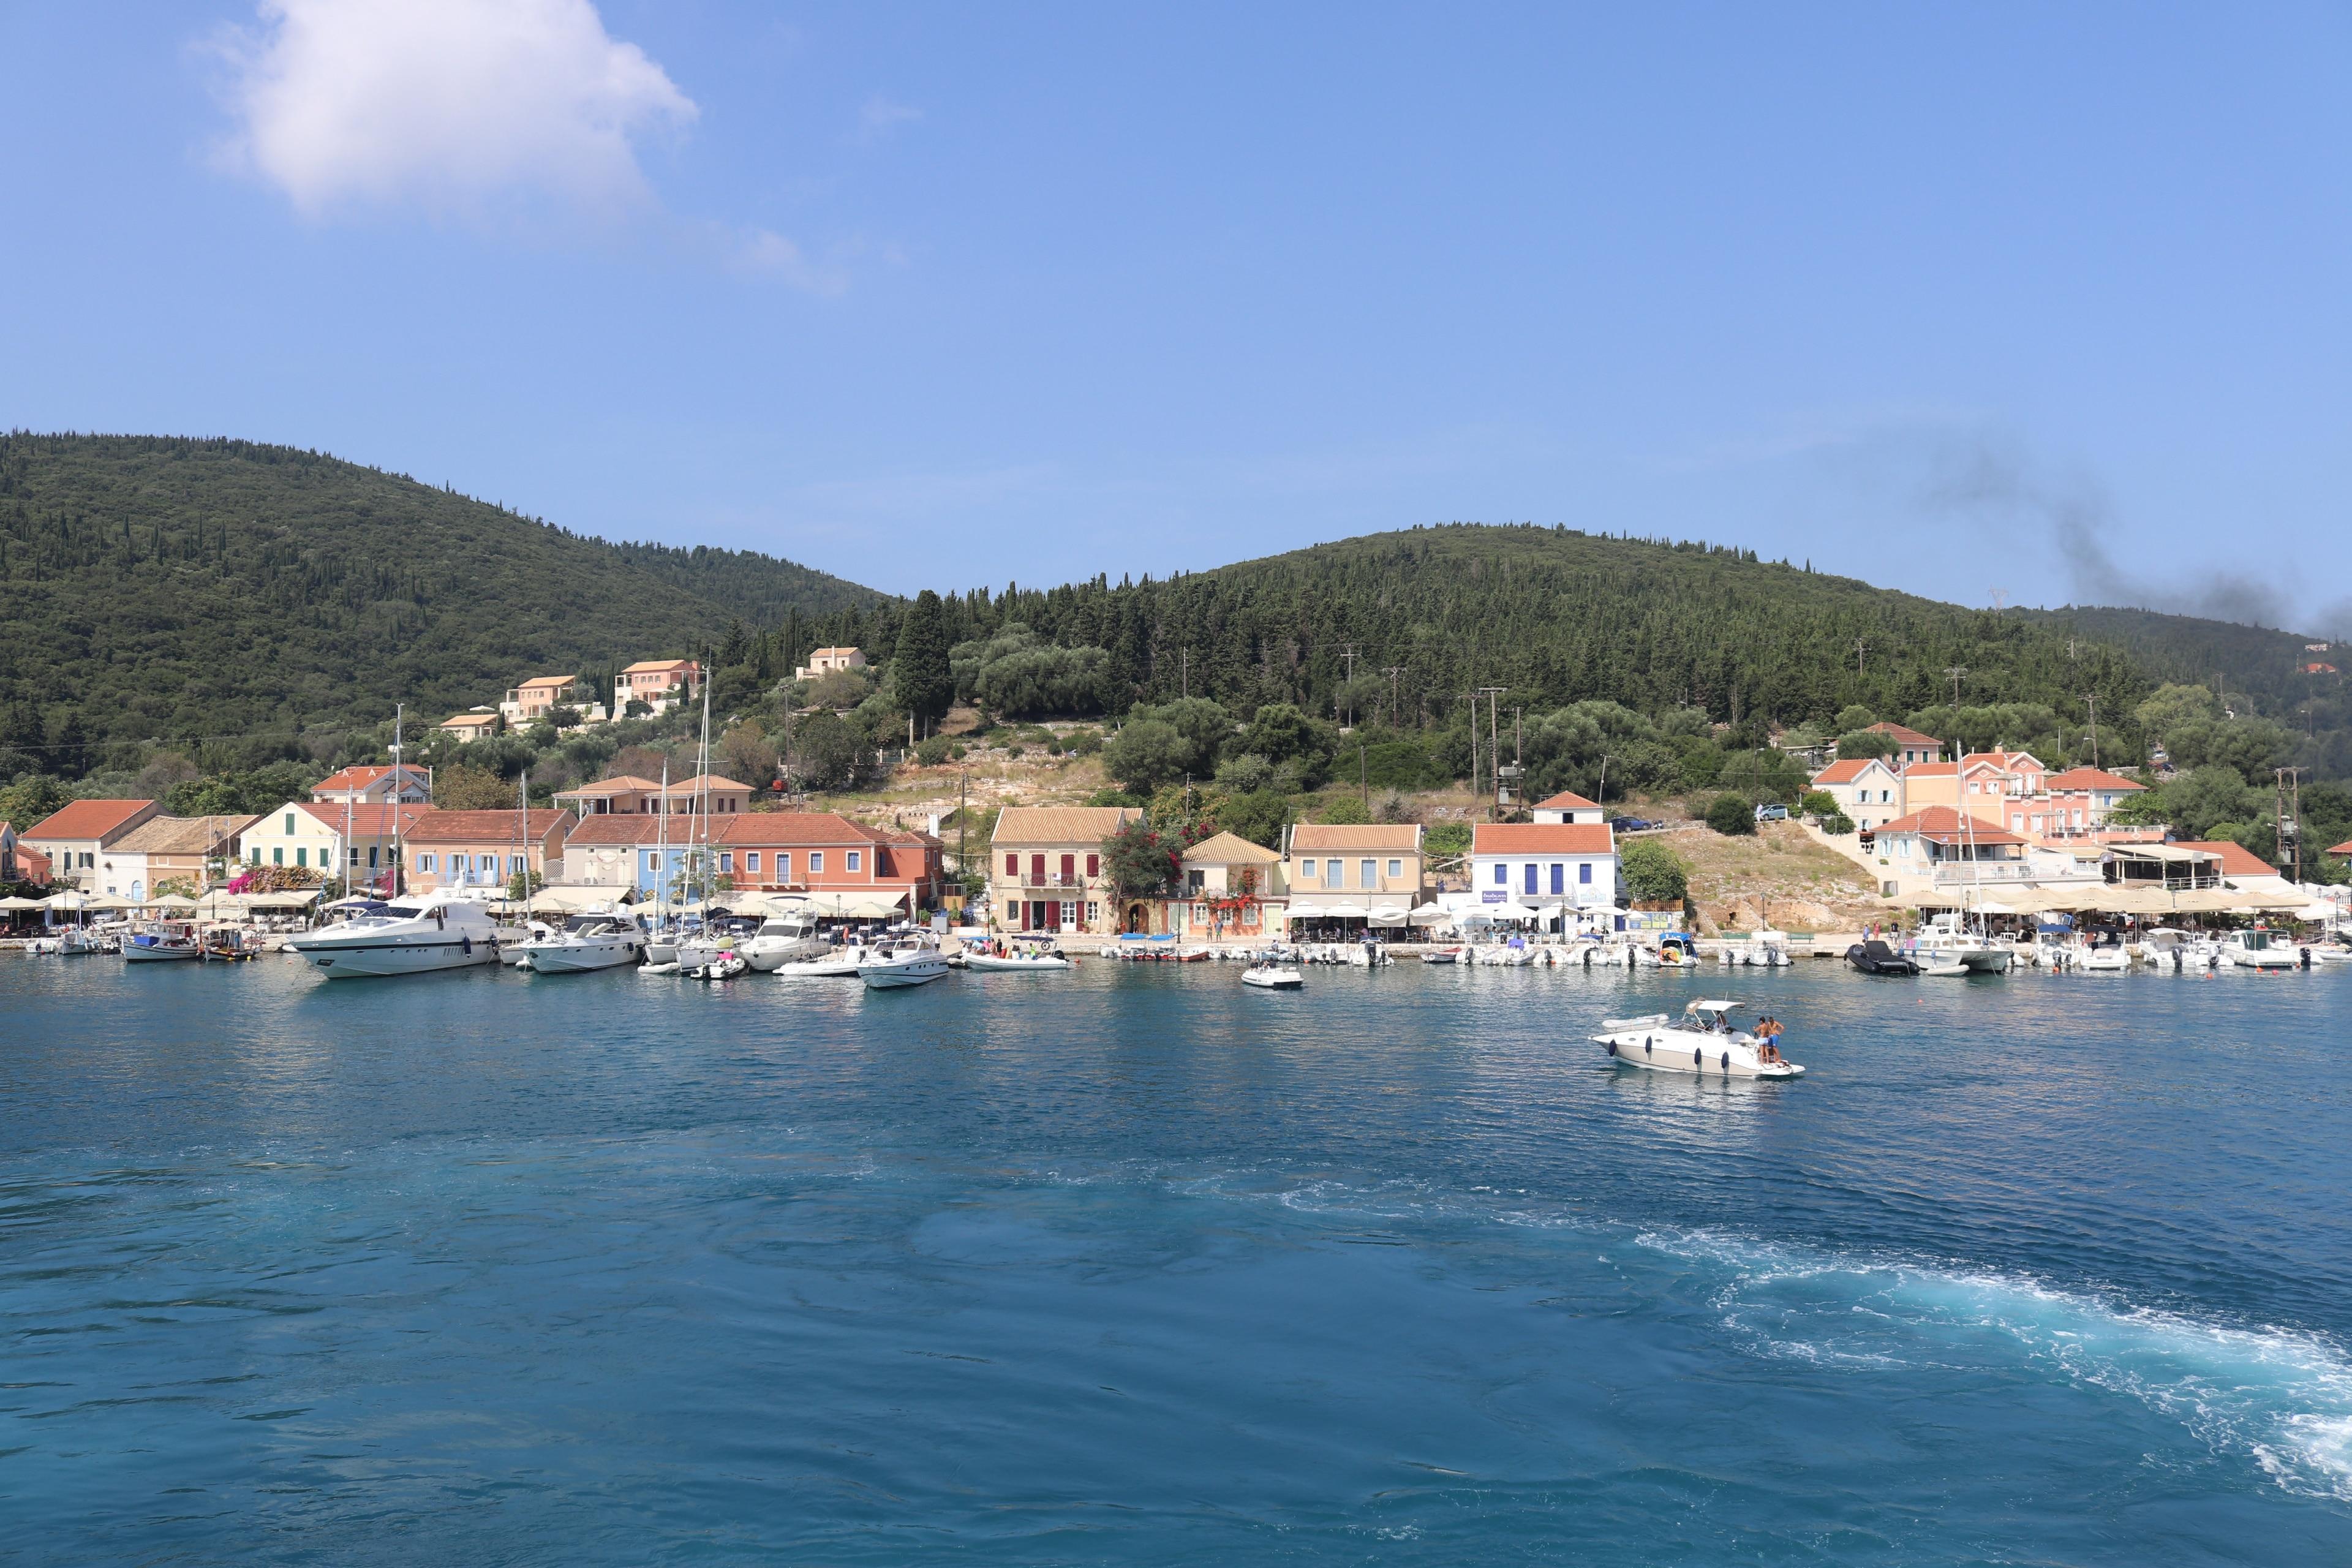 Fiskardo, Kefalonia, Regio van de Ionische Eilanden, Griekenland